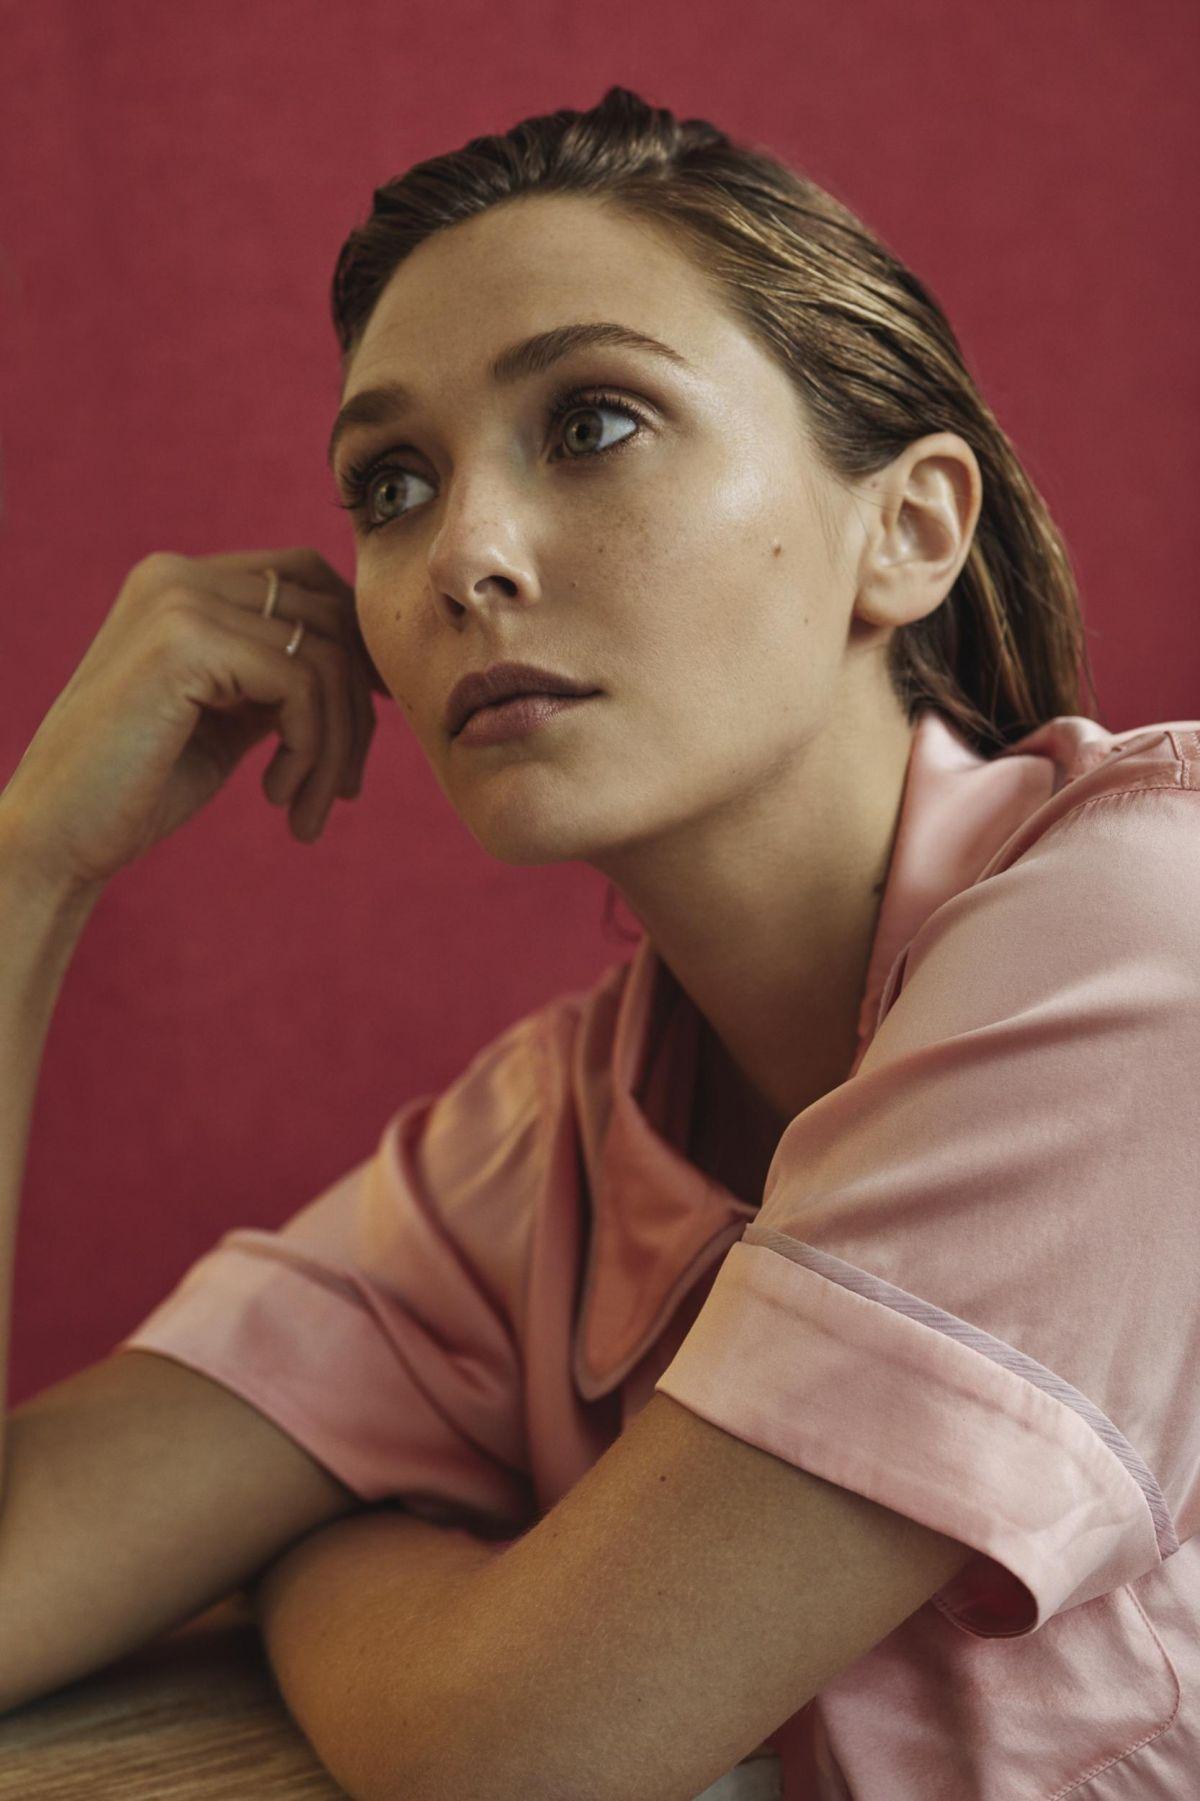 ELIZABETH OLSEN for ES Magazine, August 2017